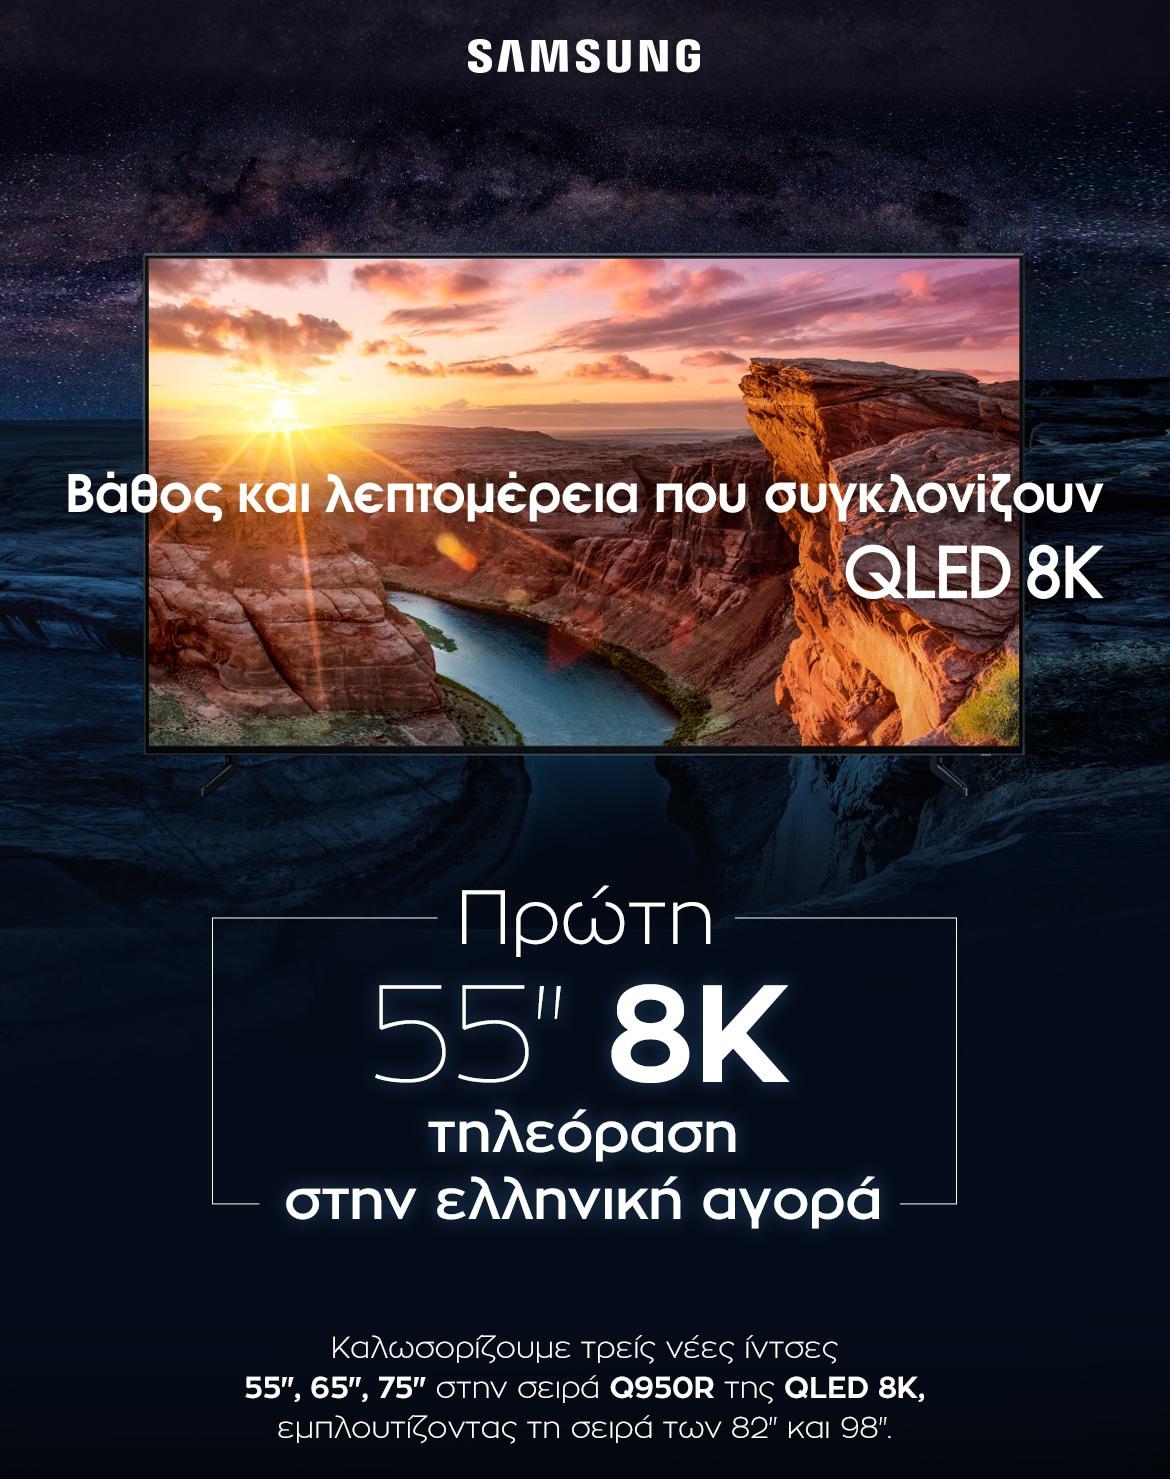 01_Samsung_8K_